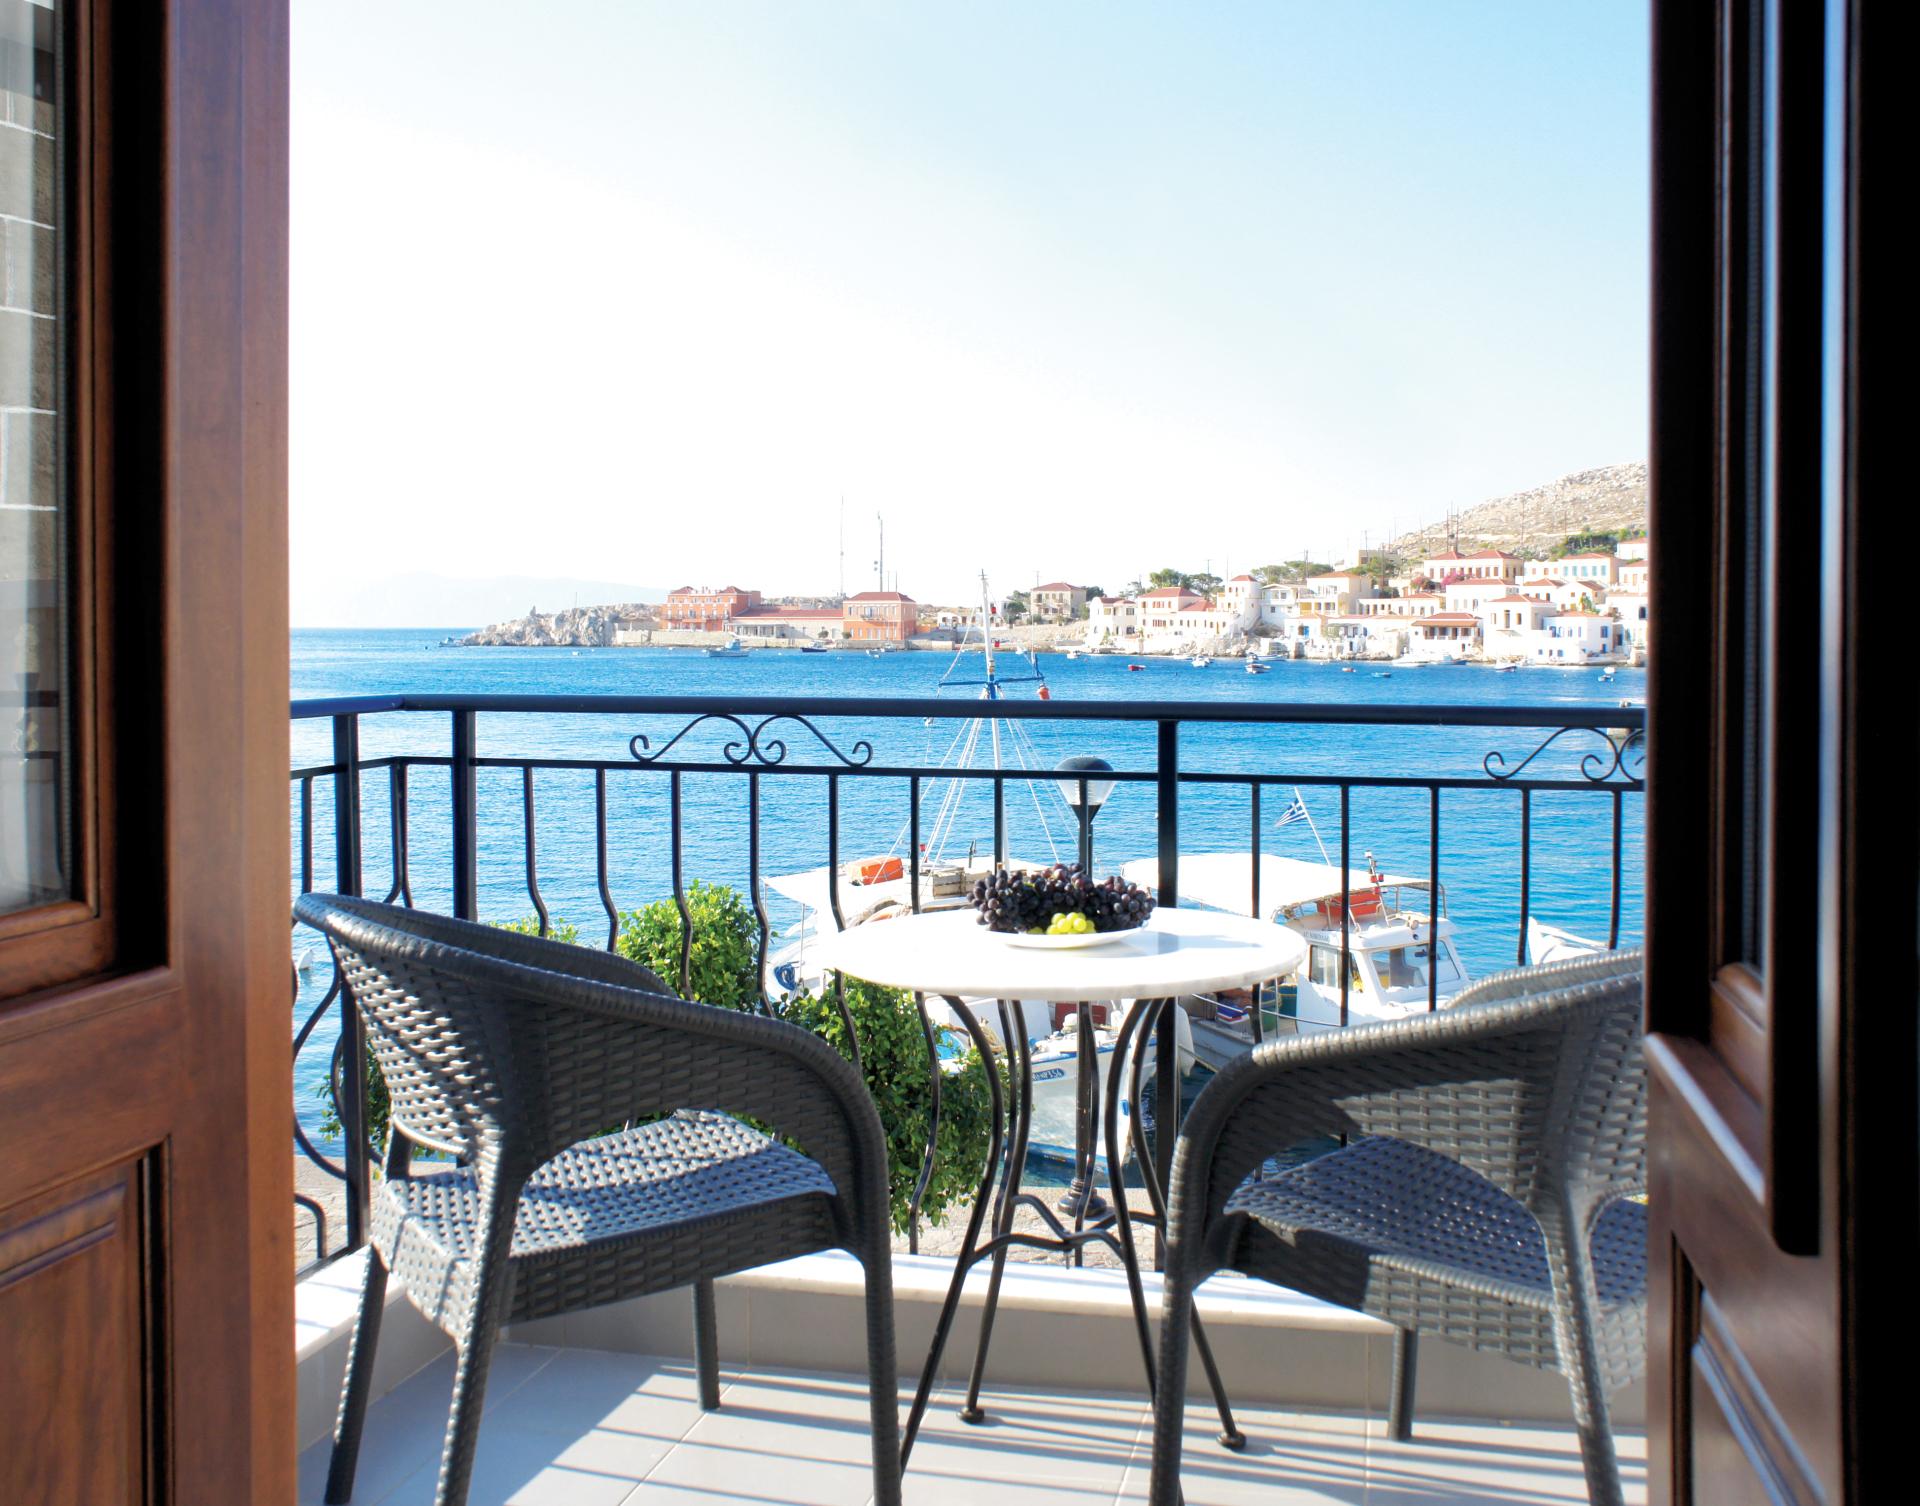 The balcony, sea view